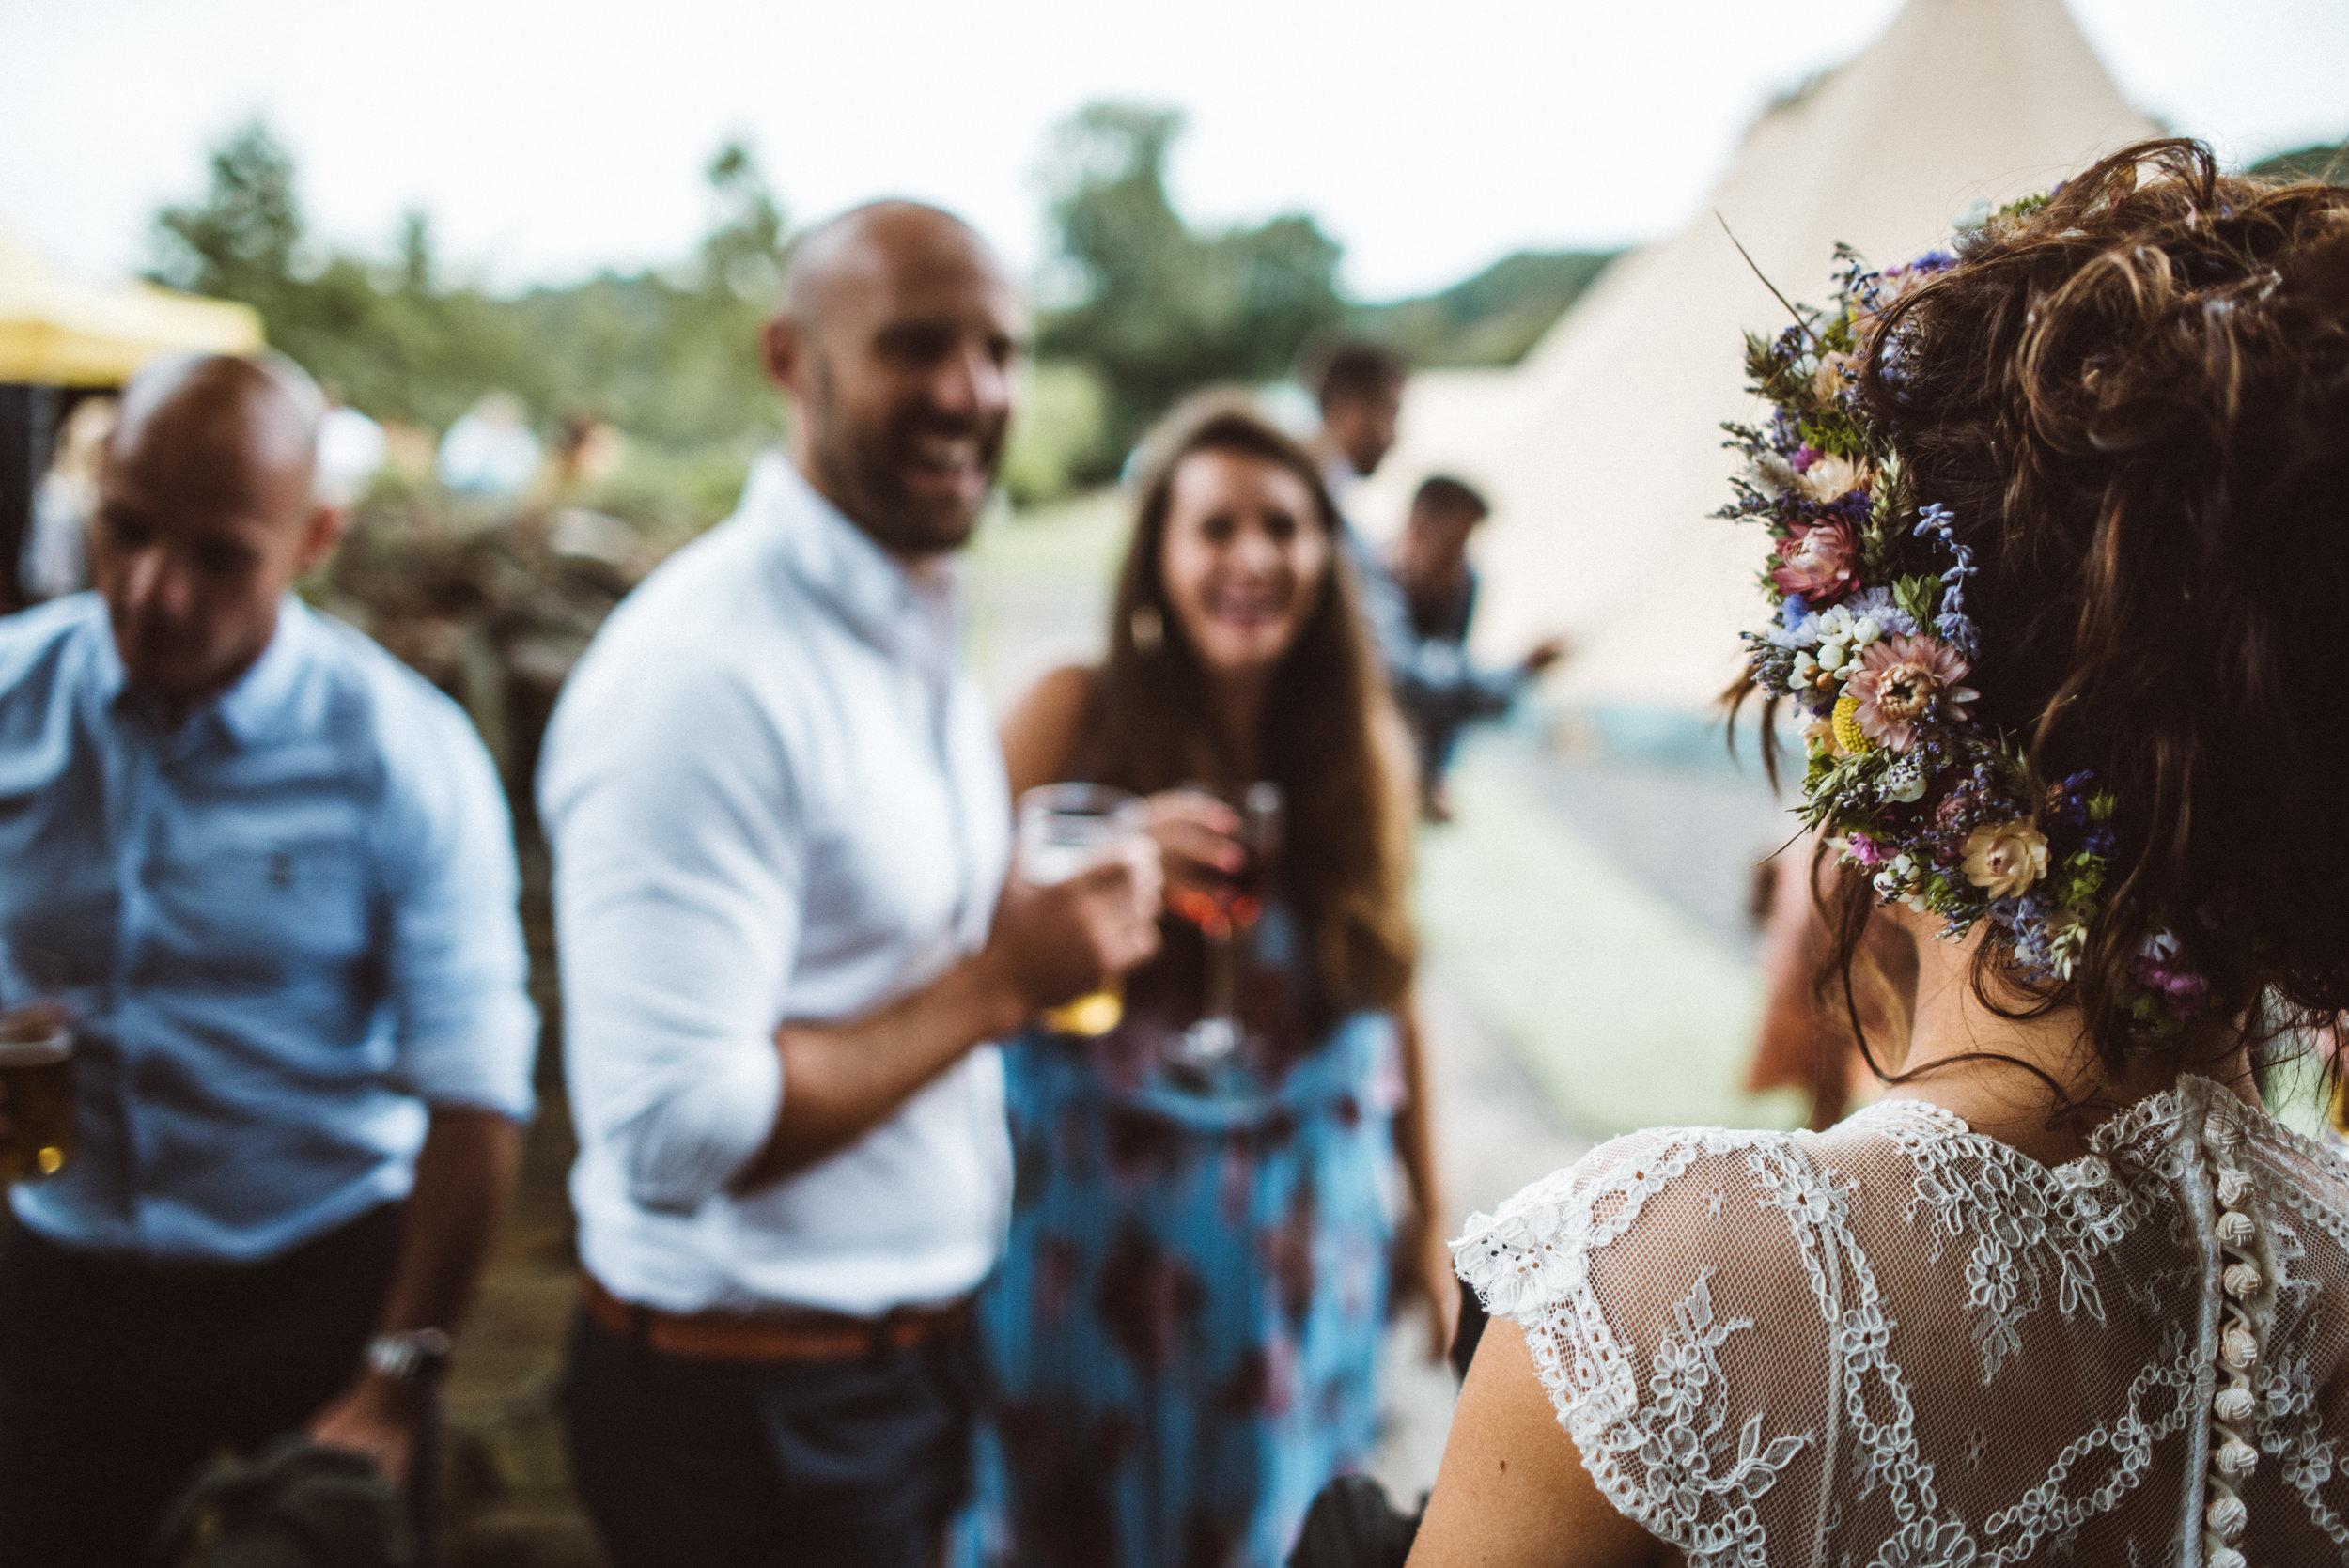 pengenna-manor-wedding-photographer-72.jpg